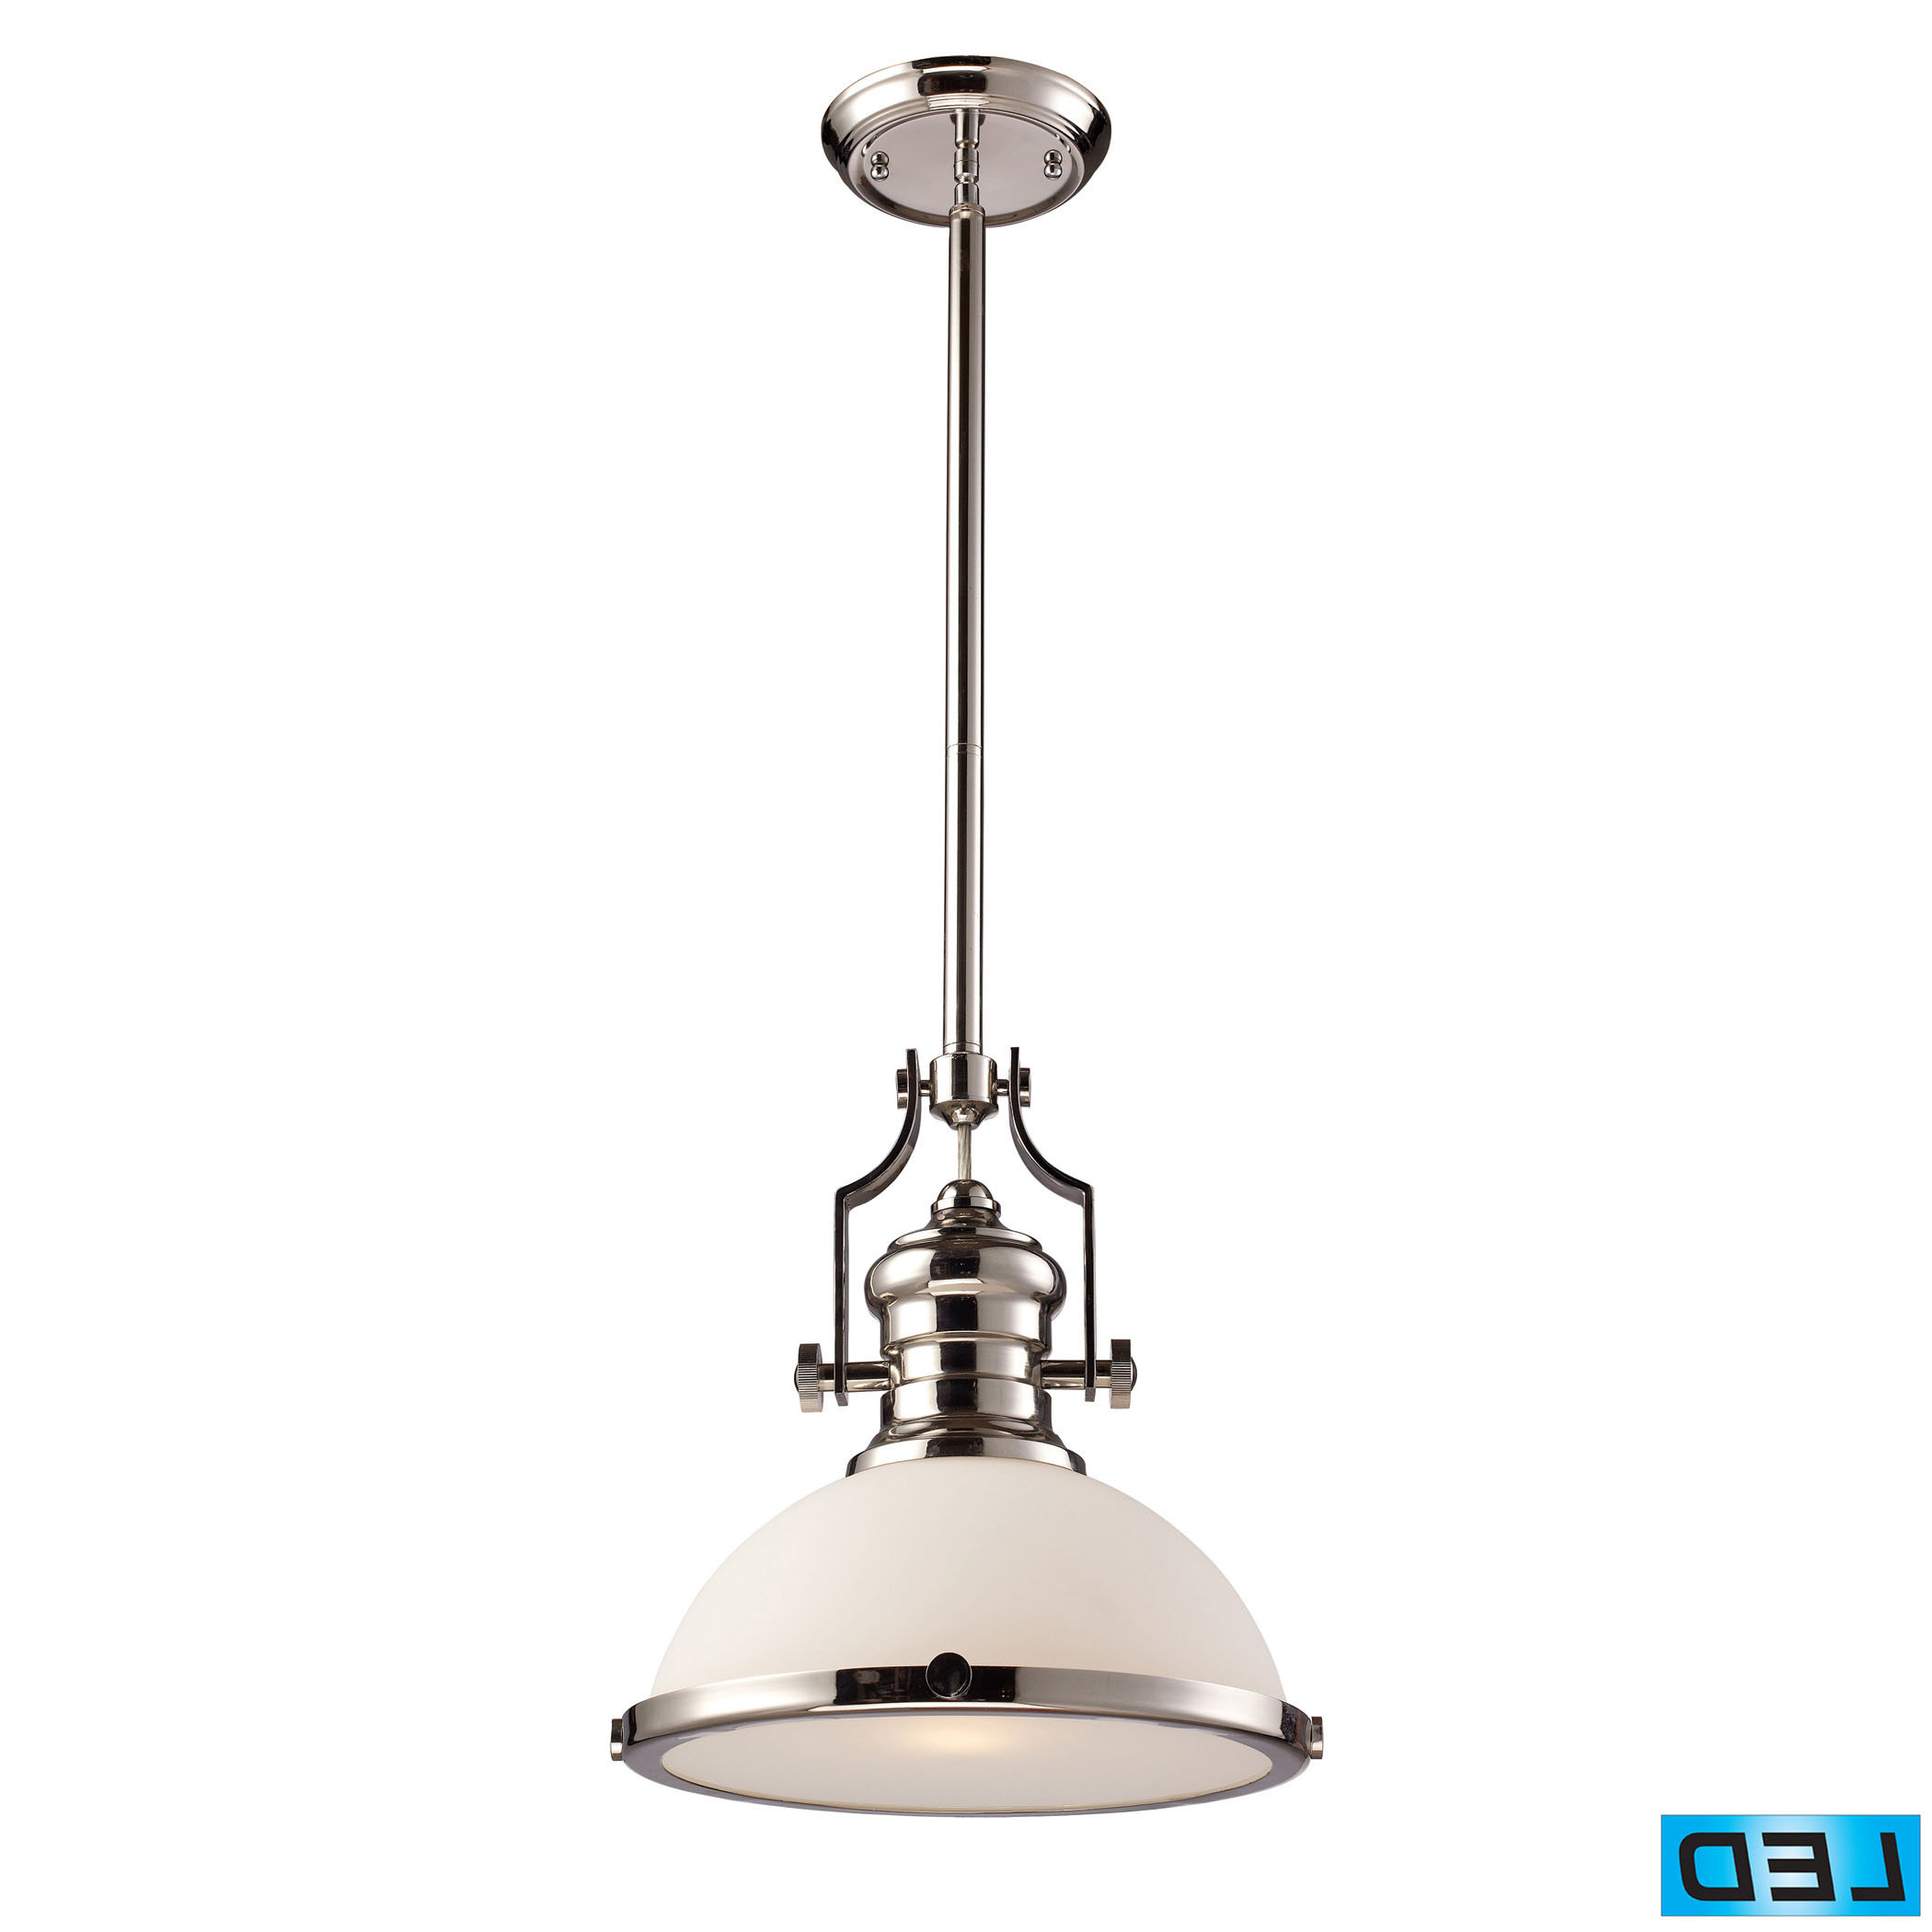 Priston 1 Light Single Dome Pendant For Well Liked Priston 1 Light Single Dome Pendants (View 8 of 20)